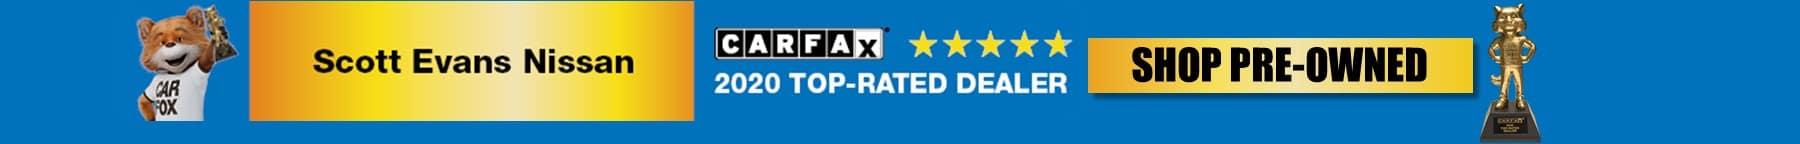 Slide- Carfax Praise desktop